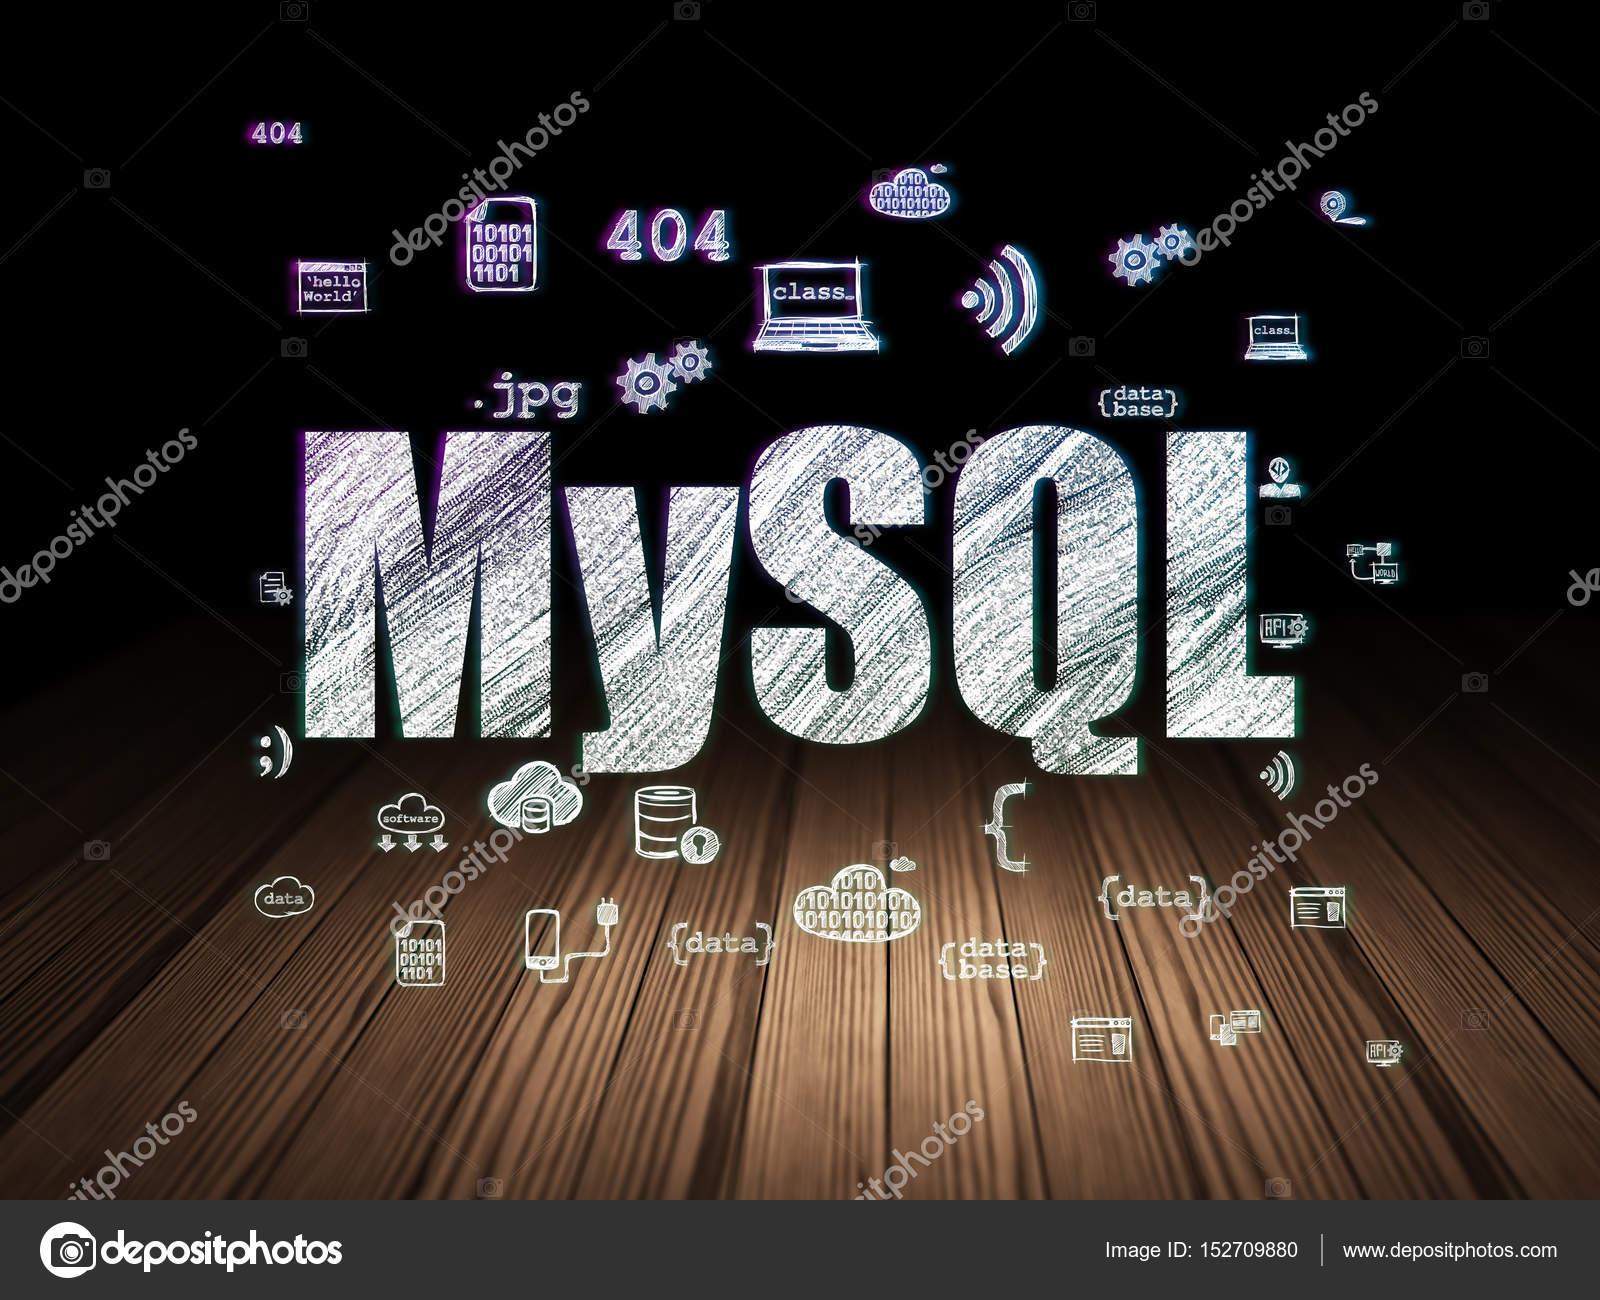 Holzfußboden Kreuzworträtsel ~ Programmierung konzept: mysql in grunge dunkelkammer u2014 stockfoto